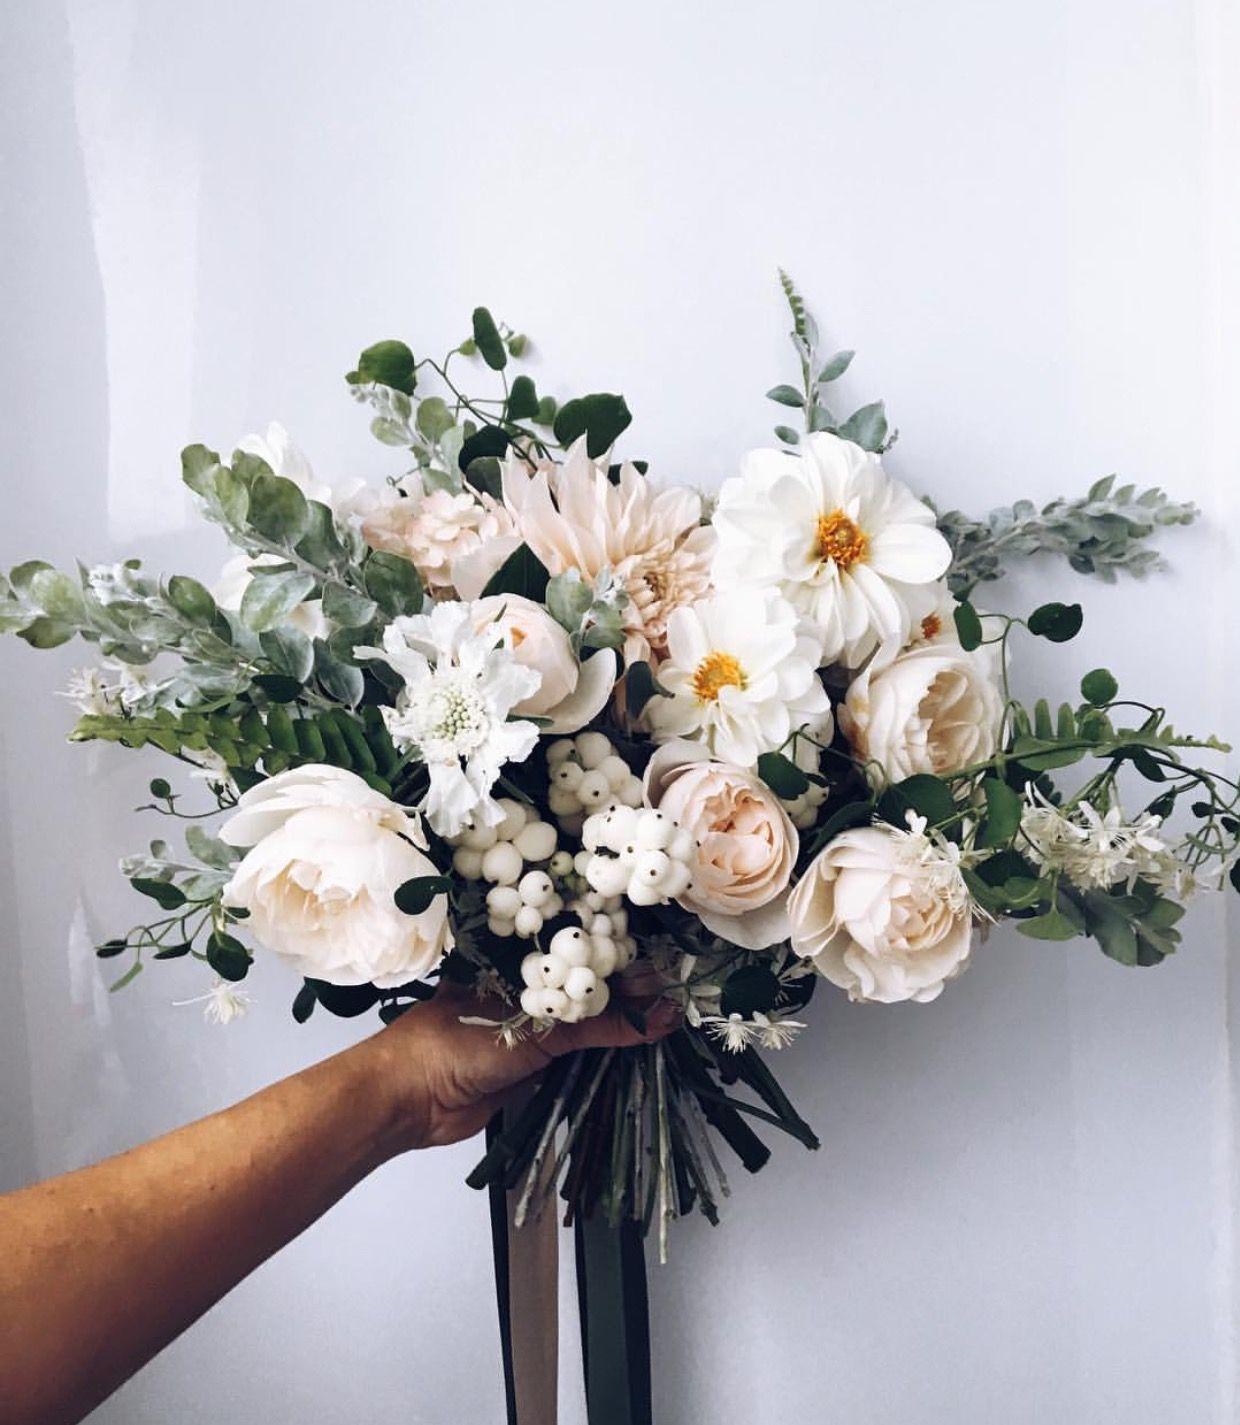 Pinterest Oliviastromberg In 2020 Flower Arrangements Floral Bouquets Wedding Flowers